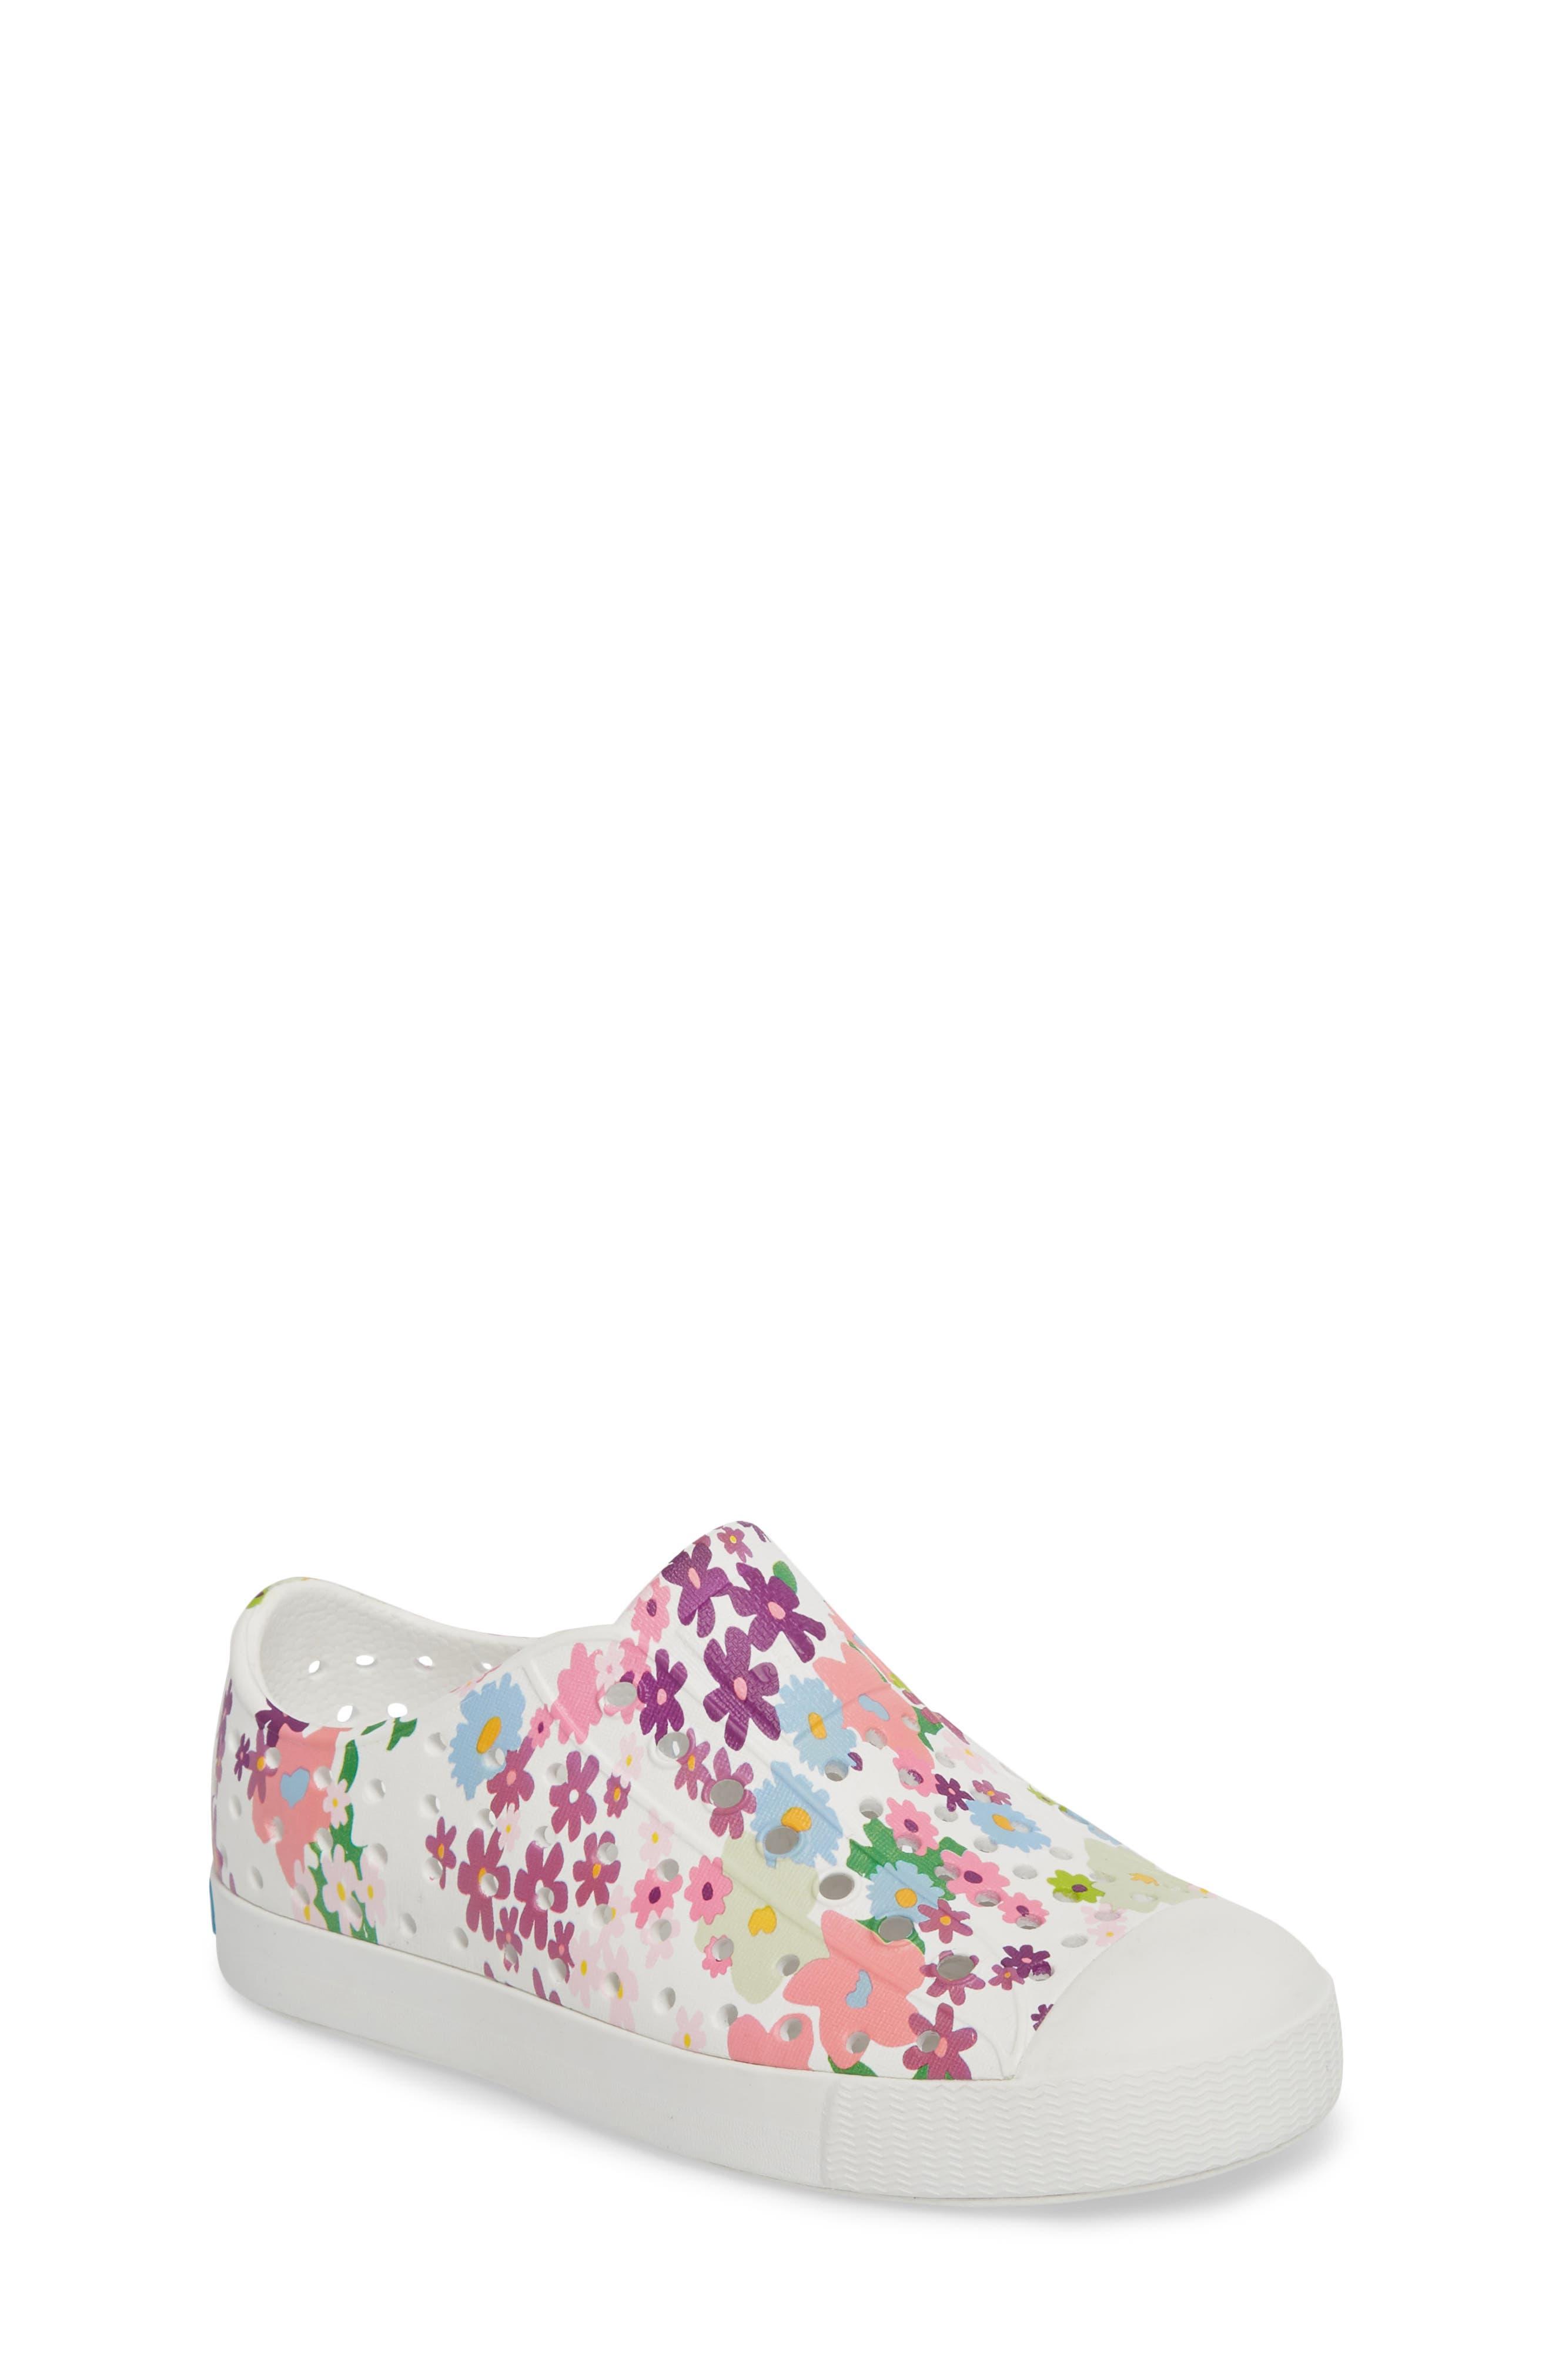 Jefferson Quartz Slip-On Vegan Sneaker,                             Main thumbnail 1, color,                             SHELL WHITE/ DAISY PRINT